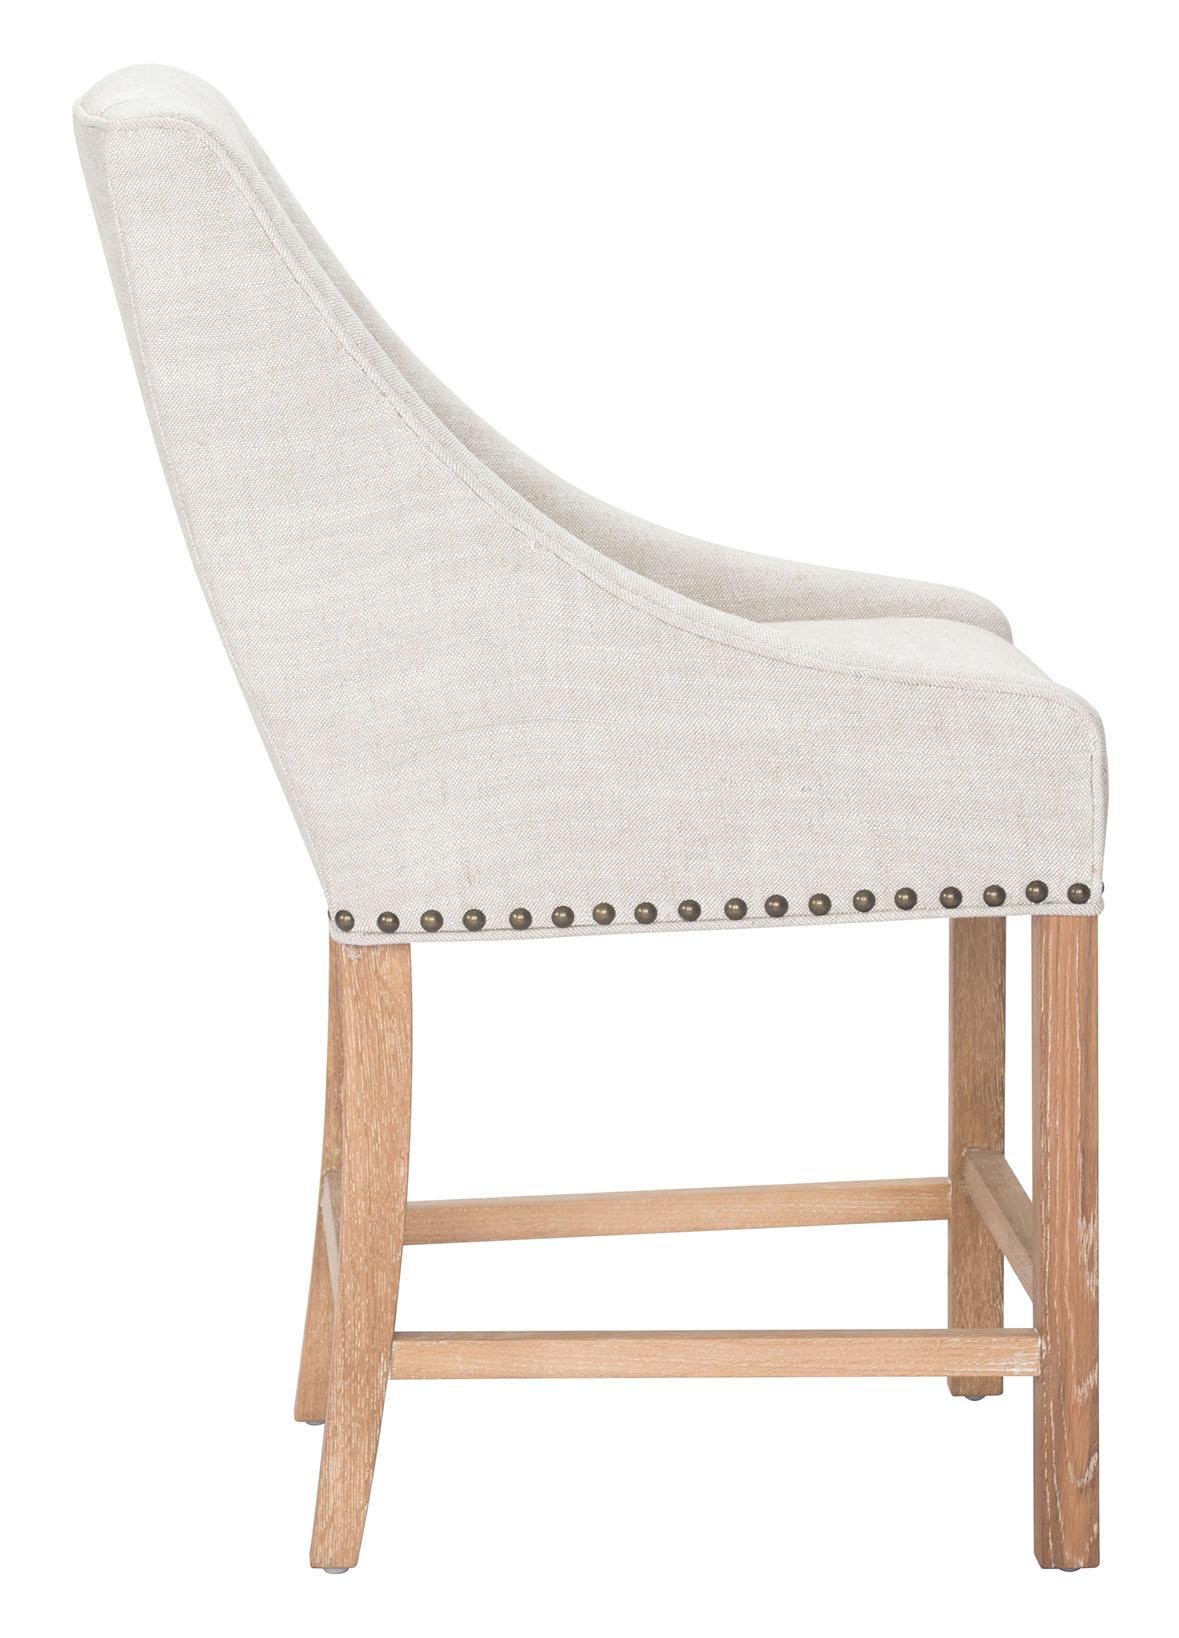 zuo-indio-counter-chair-beige.jpg